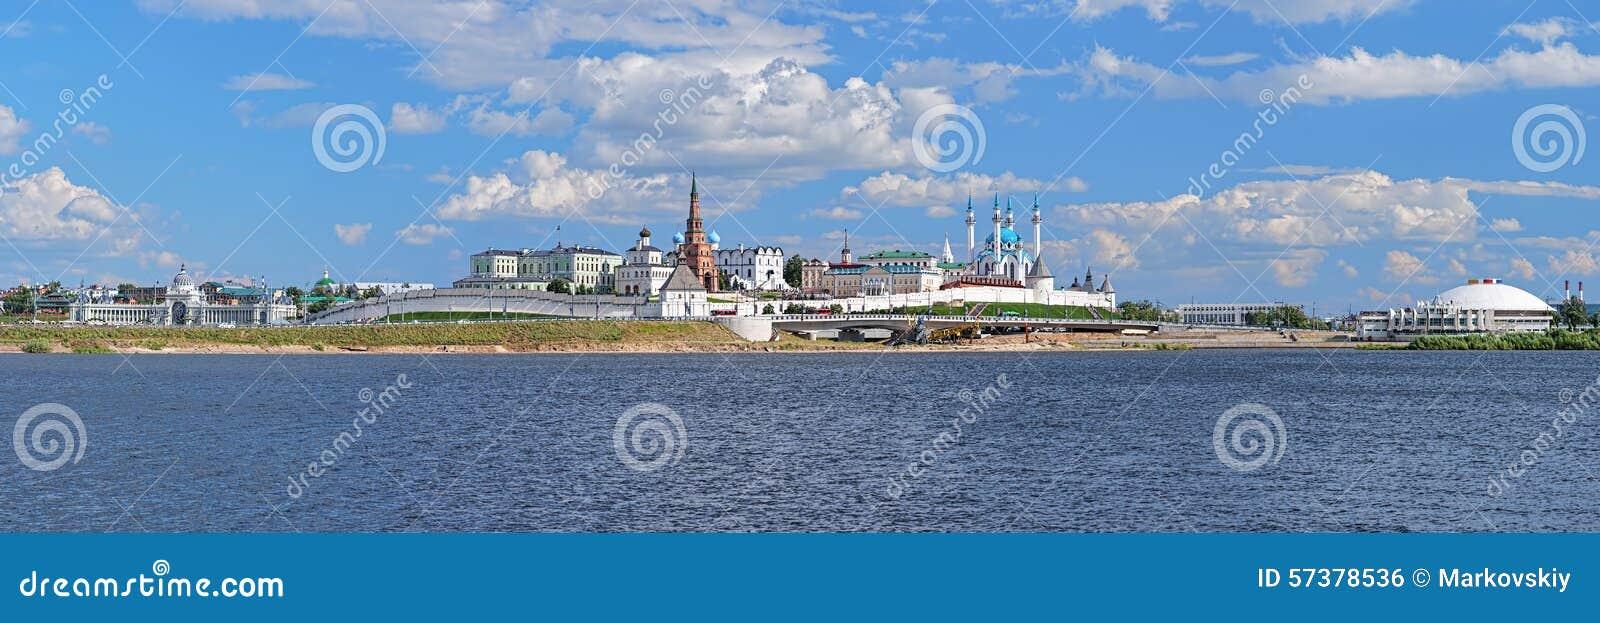 Panorama van Kazan het Kremlin, Republiek Tatarstan, Rusland